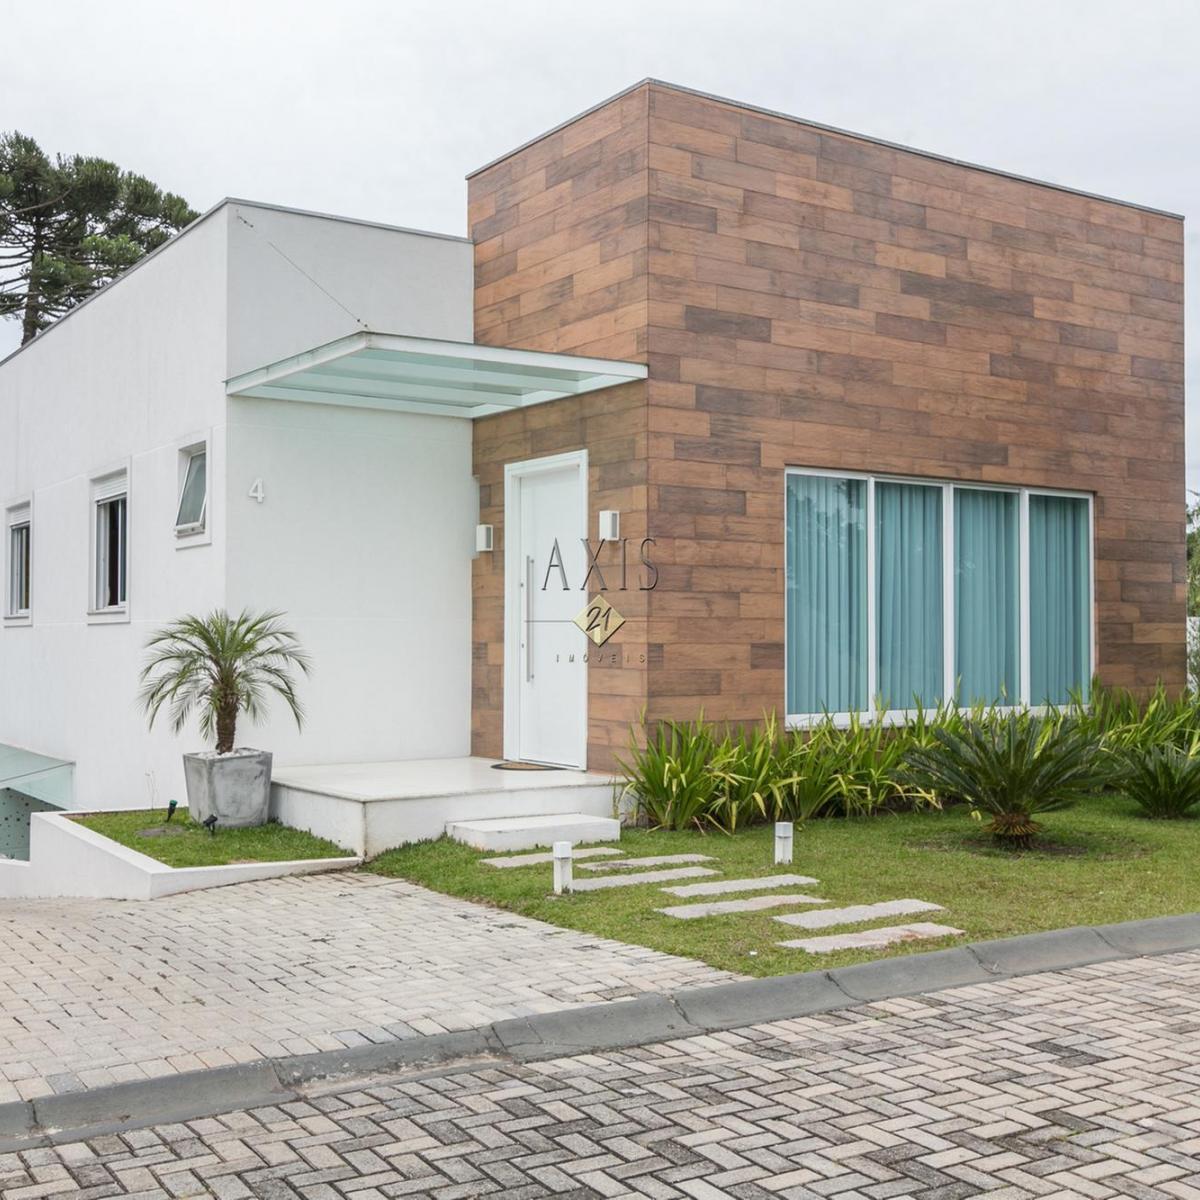 http://www.infocenterhost2.com.br/crm/fotosimovel/139017/31232942-casa-em-condominio-curitiba-sao-braz_marcadagua.jpg